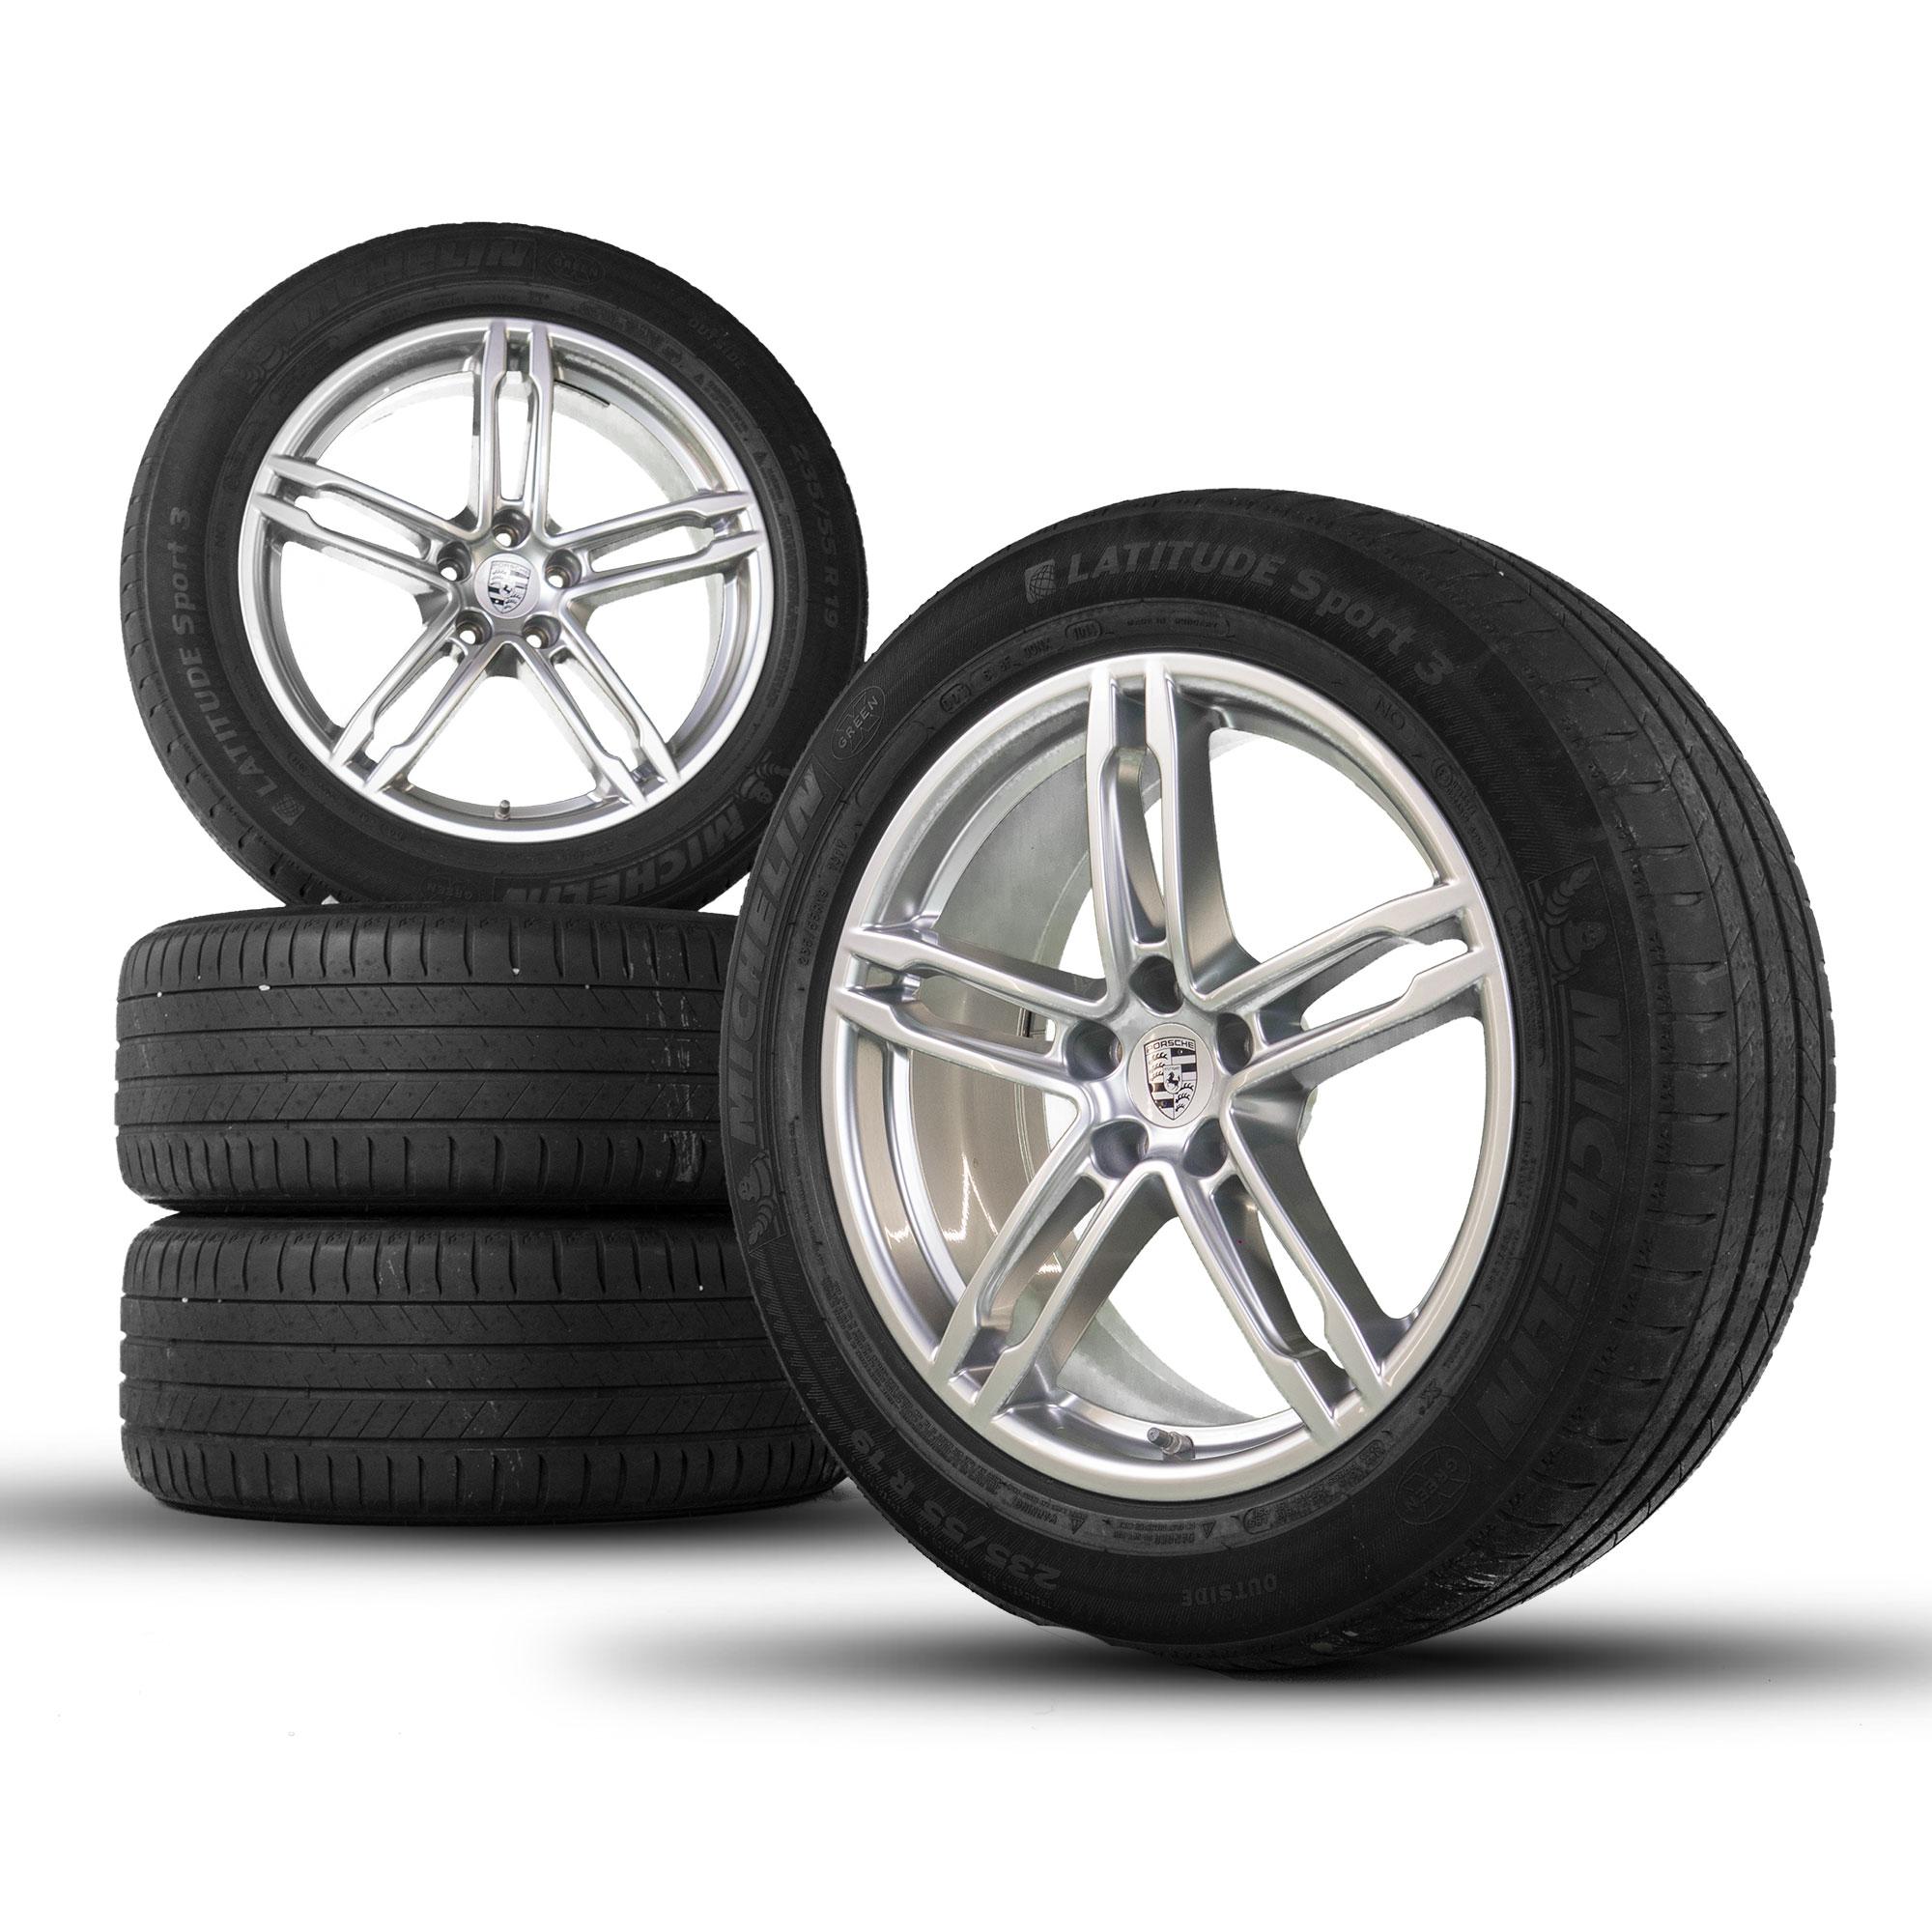 Details about Original Porsche 19 inch rims Macan S GTS turbo wheel summer  tire summer wheels